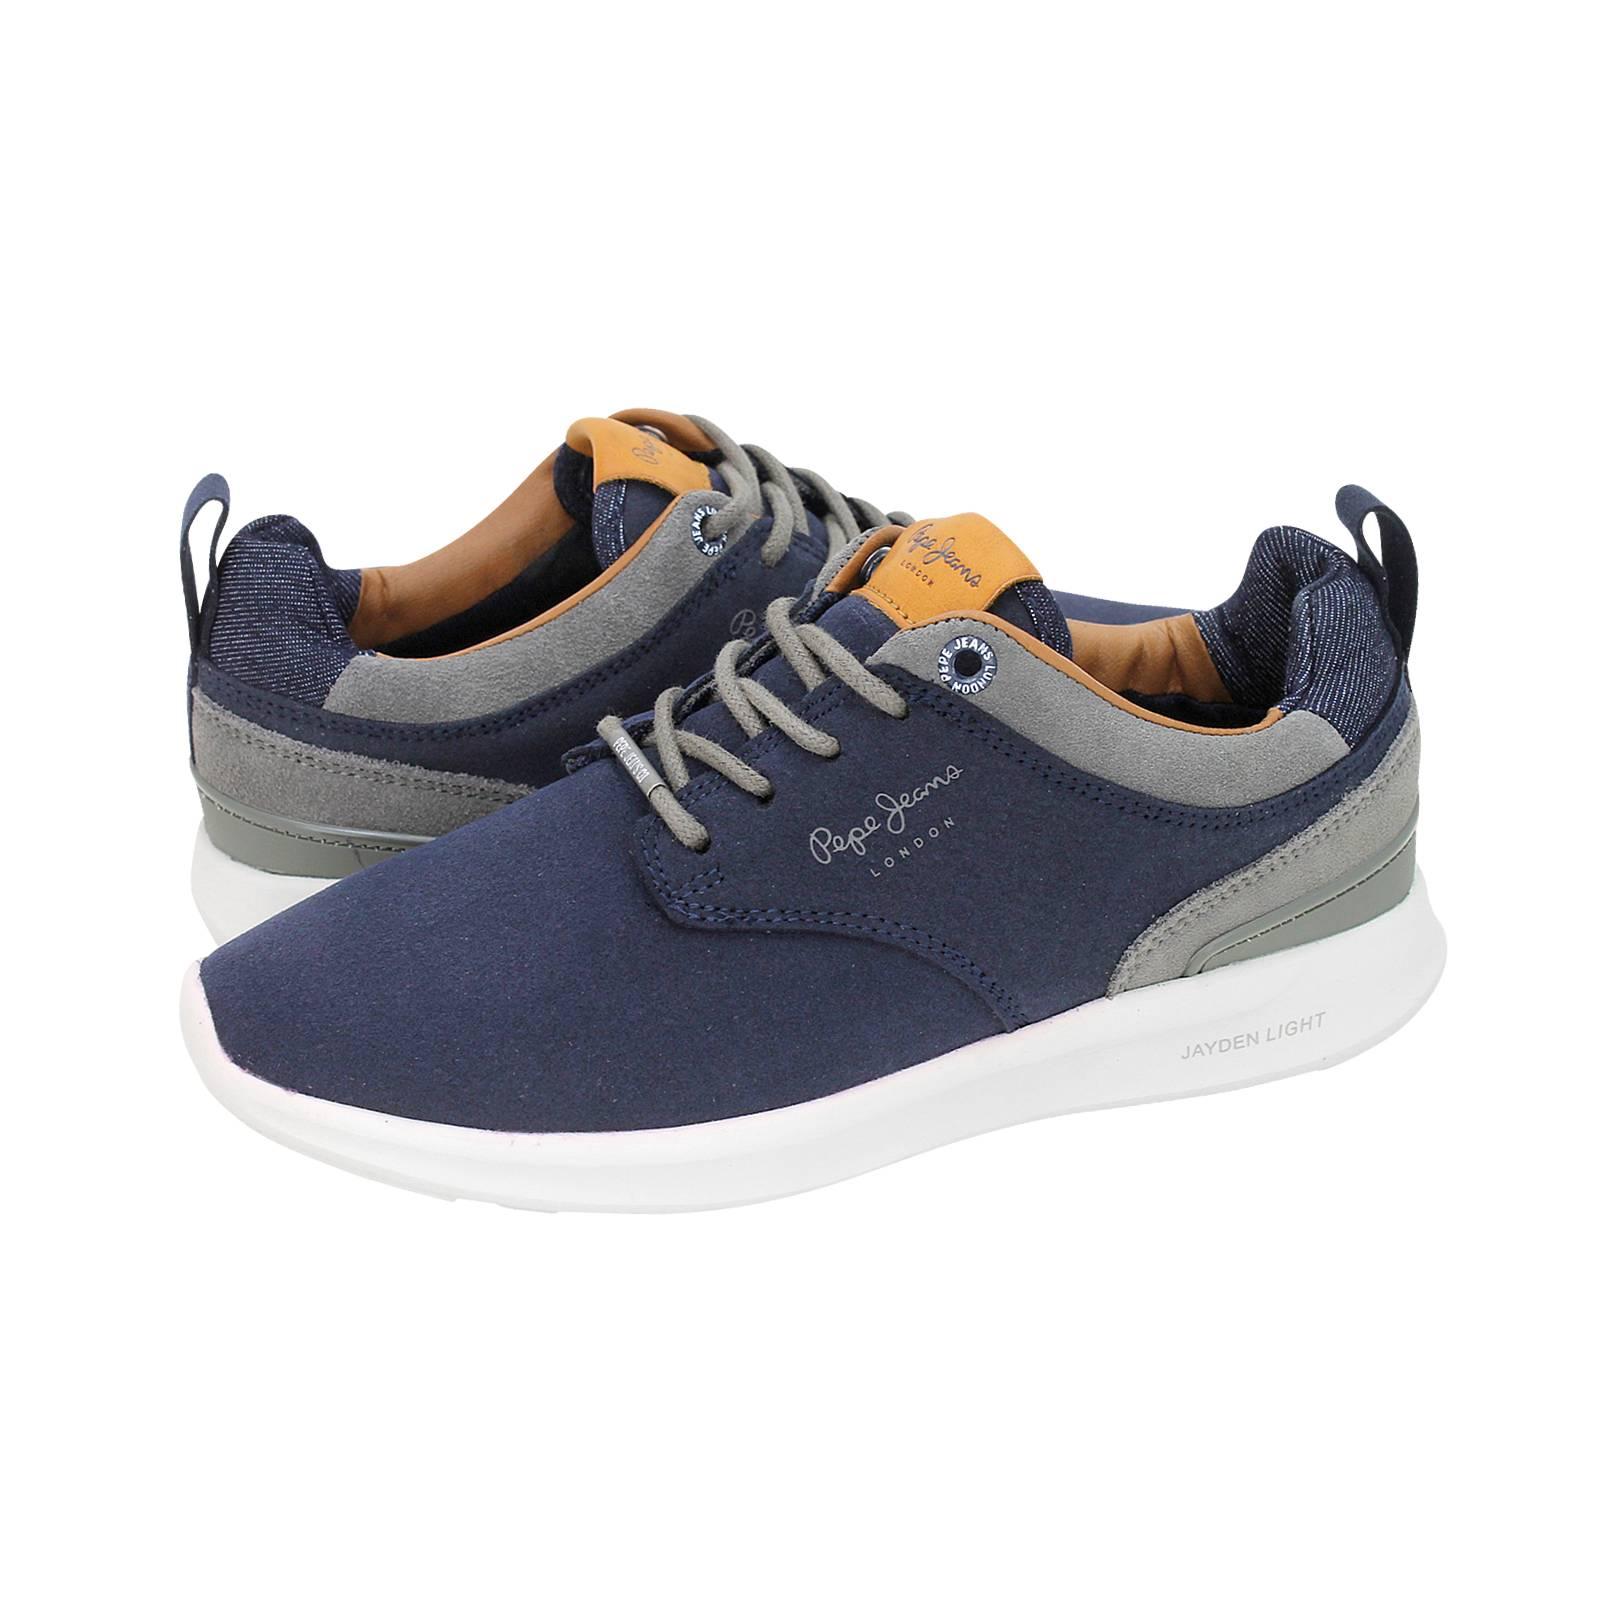 best authentic 939bd c876b Pepe Jeans Jayden Junior casual kids' shoes